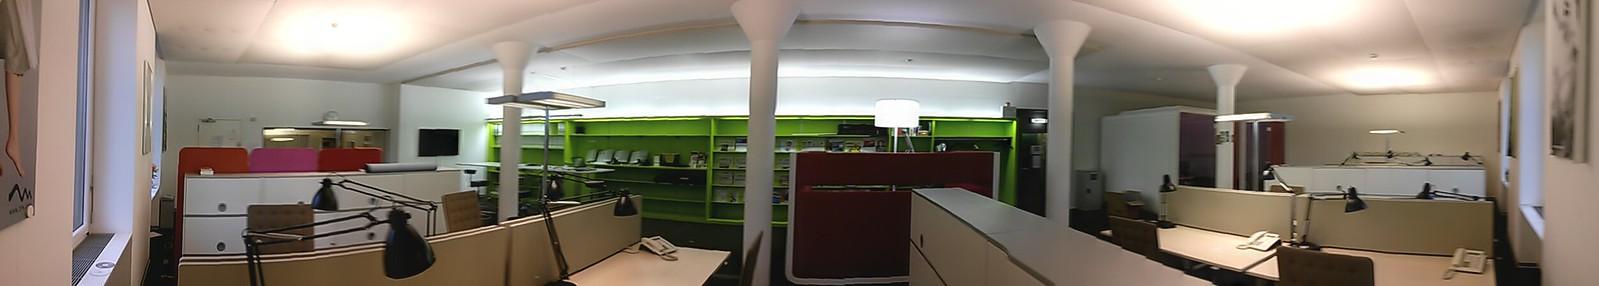 Grossraumbüro aktuelle Kultur Studio Basel